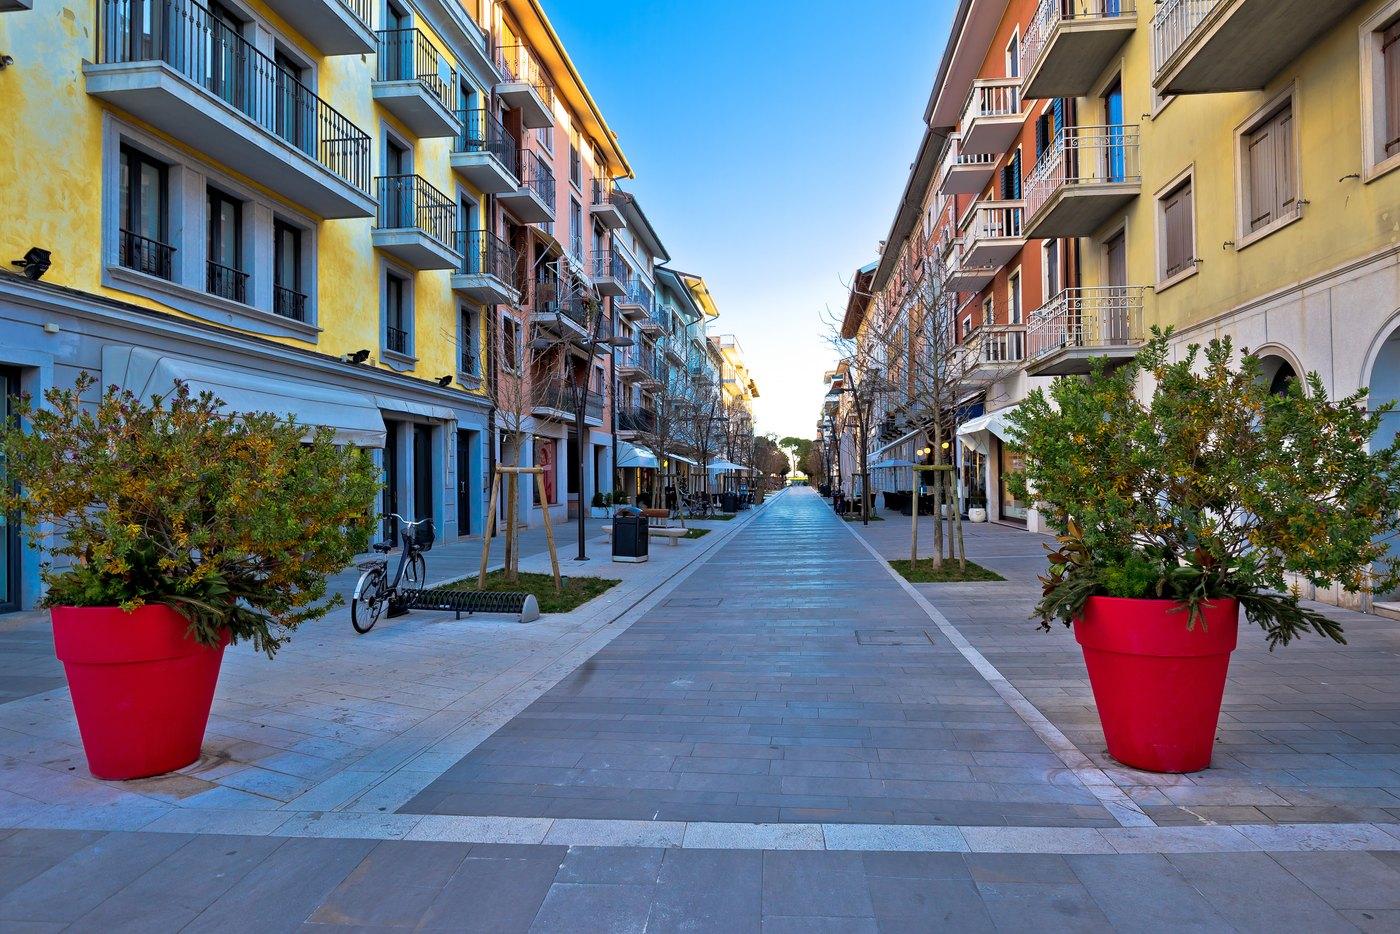 Photo Tour of East Coast Italy 13